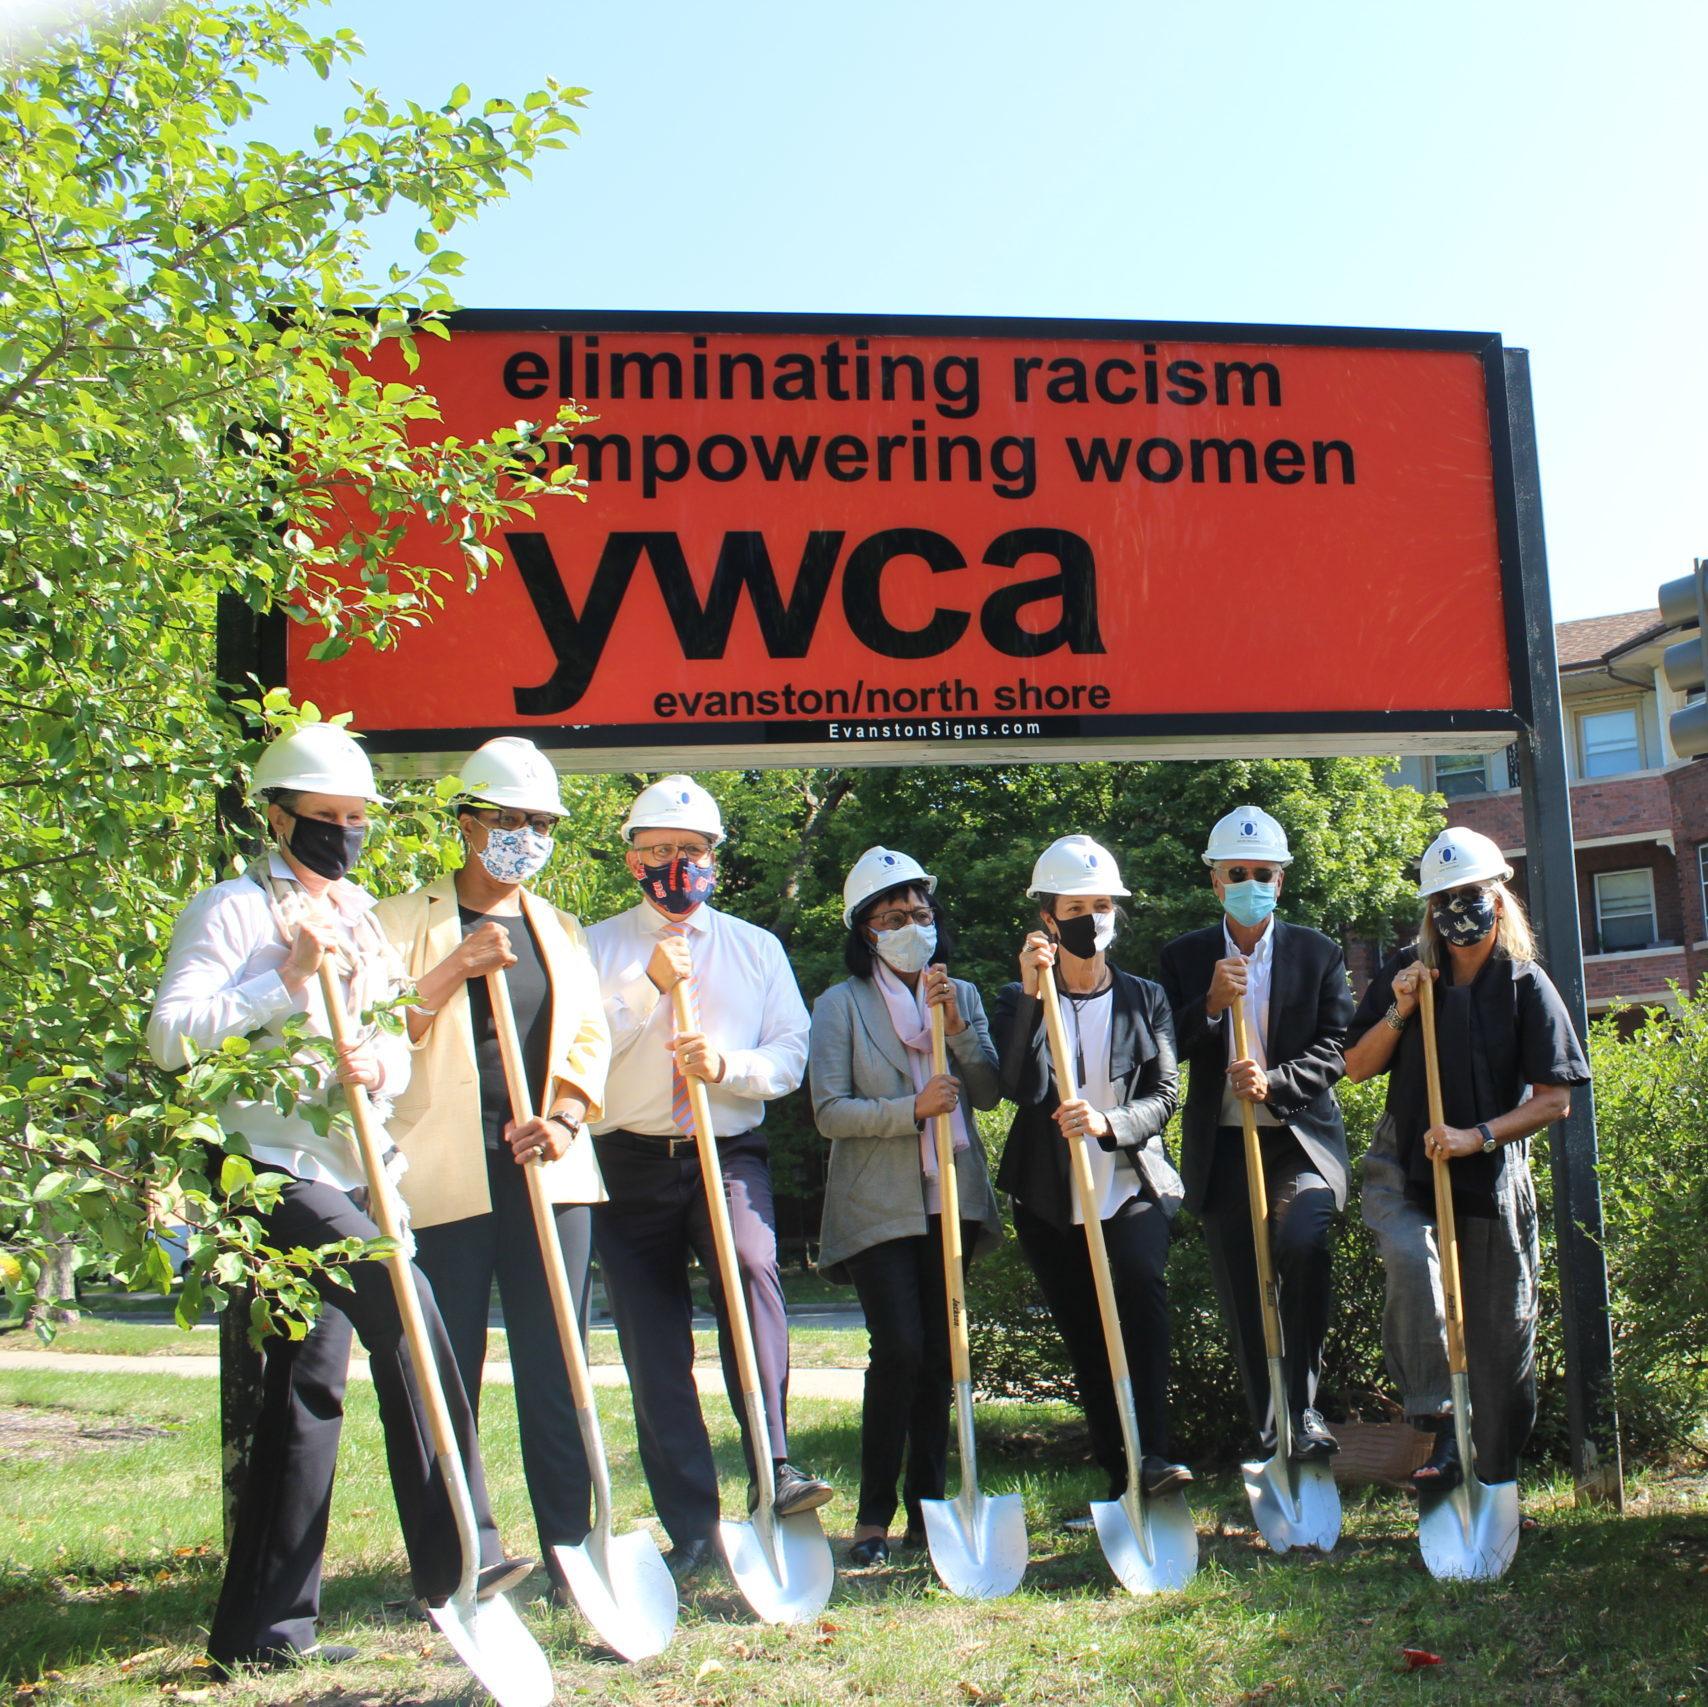 Groundbreaking for YWCA's new campus